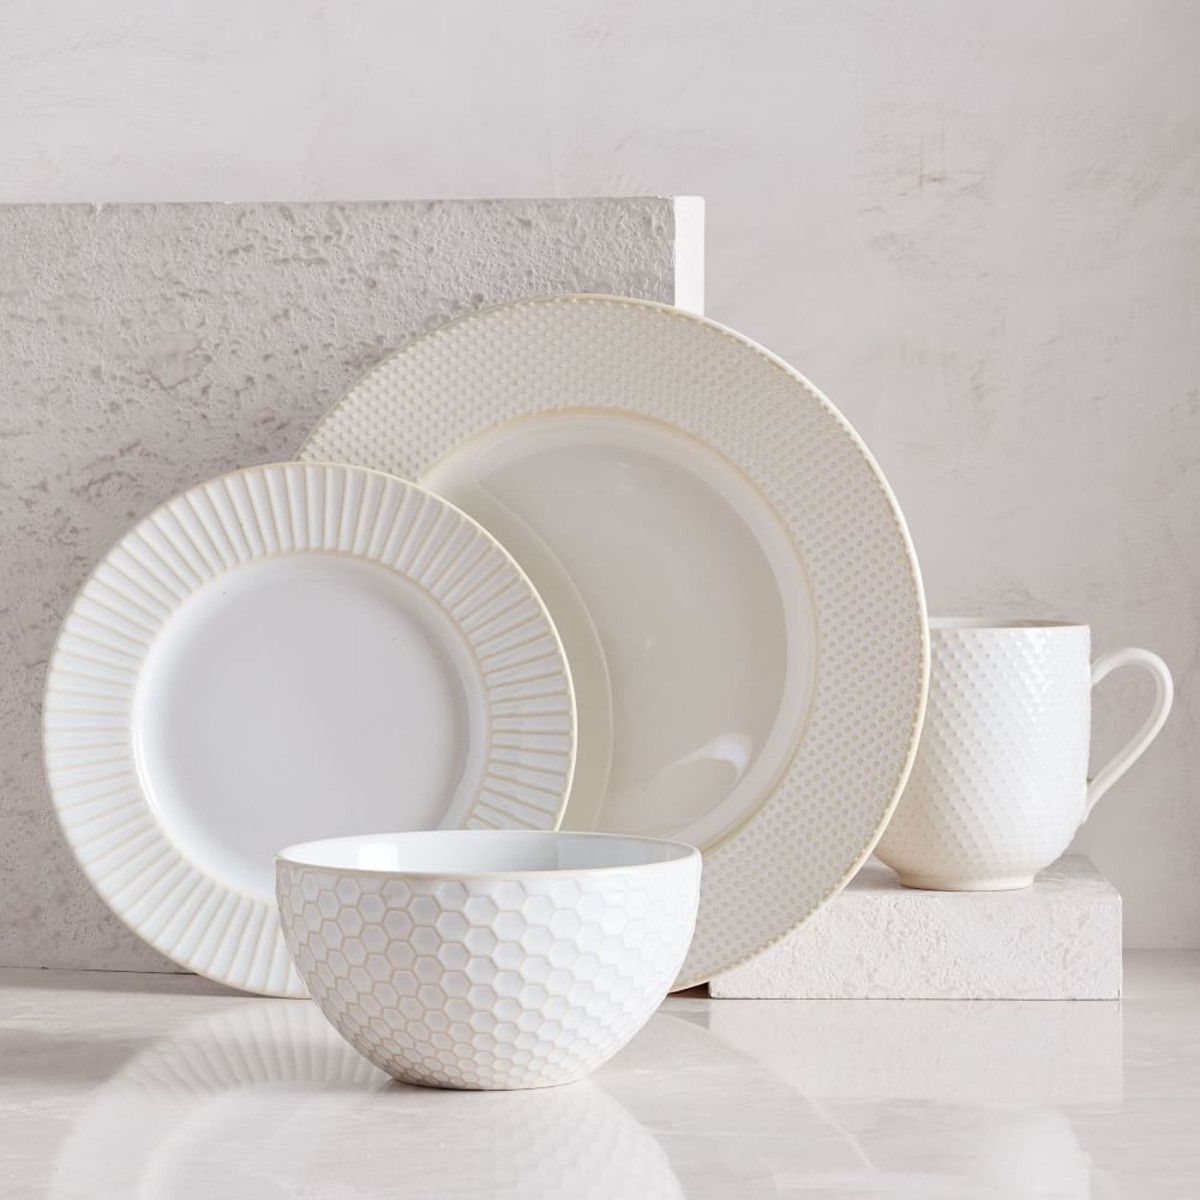 Textured West Elm White Dinnerware Stoneware Sets Mugs Set